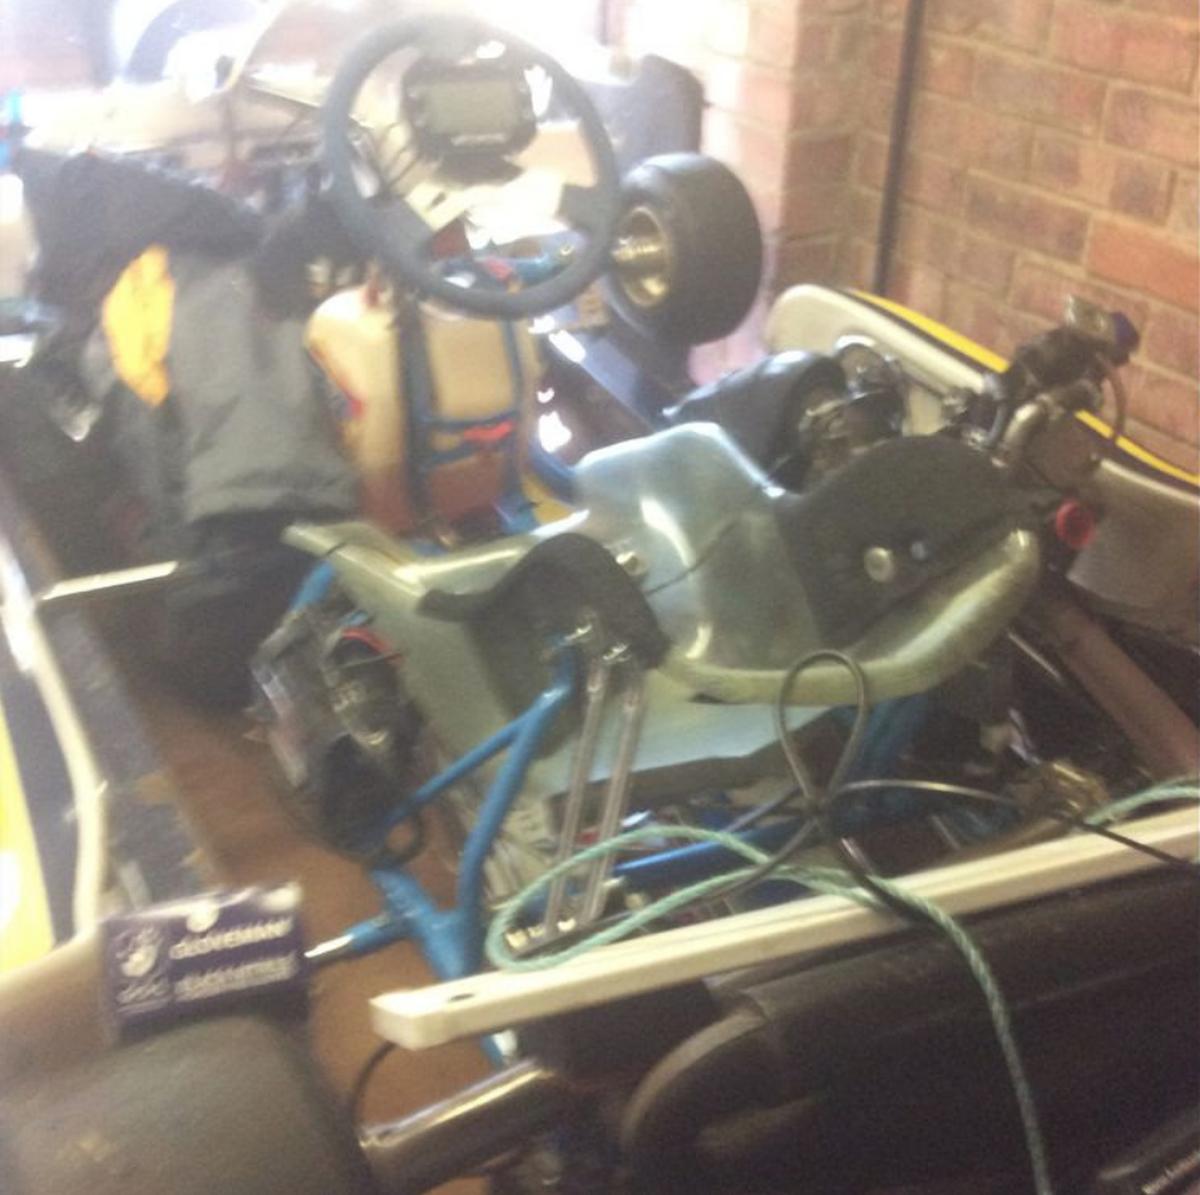 Secondhand Karting Co Uk Single Karts 2016 Alonso